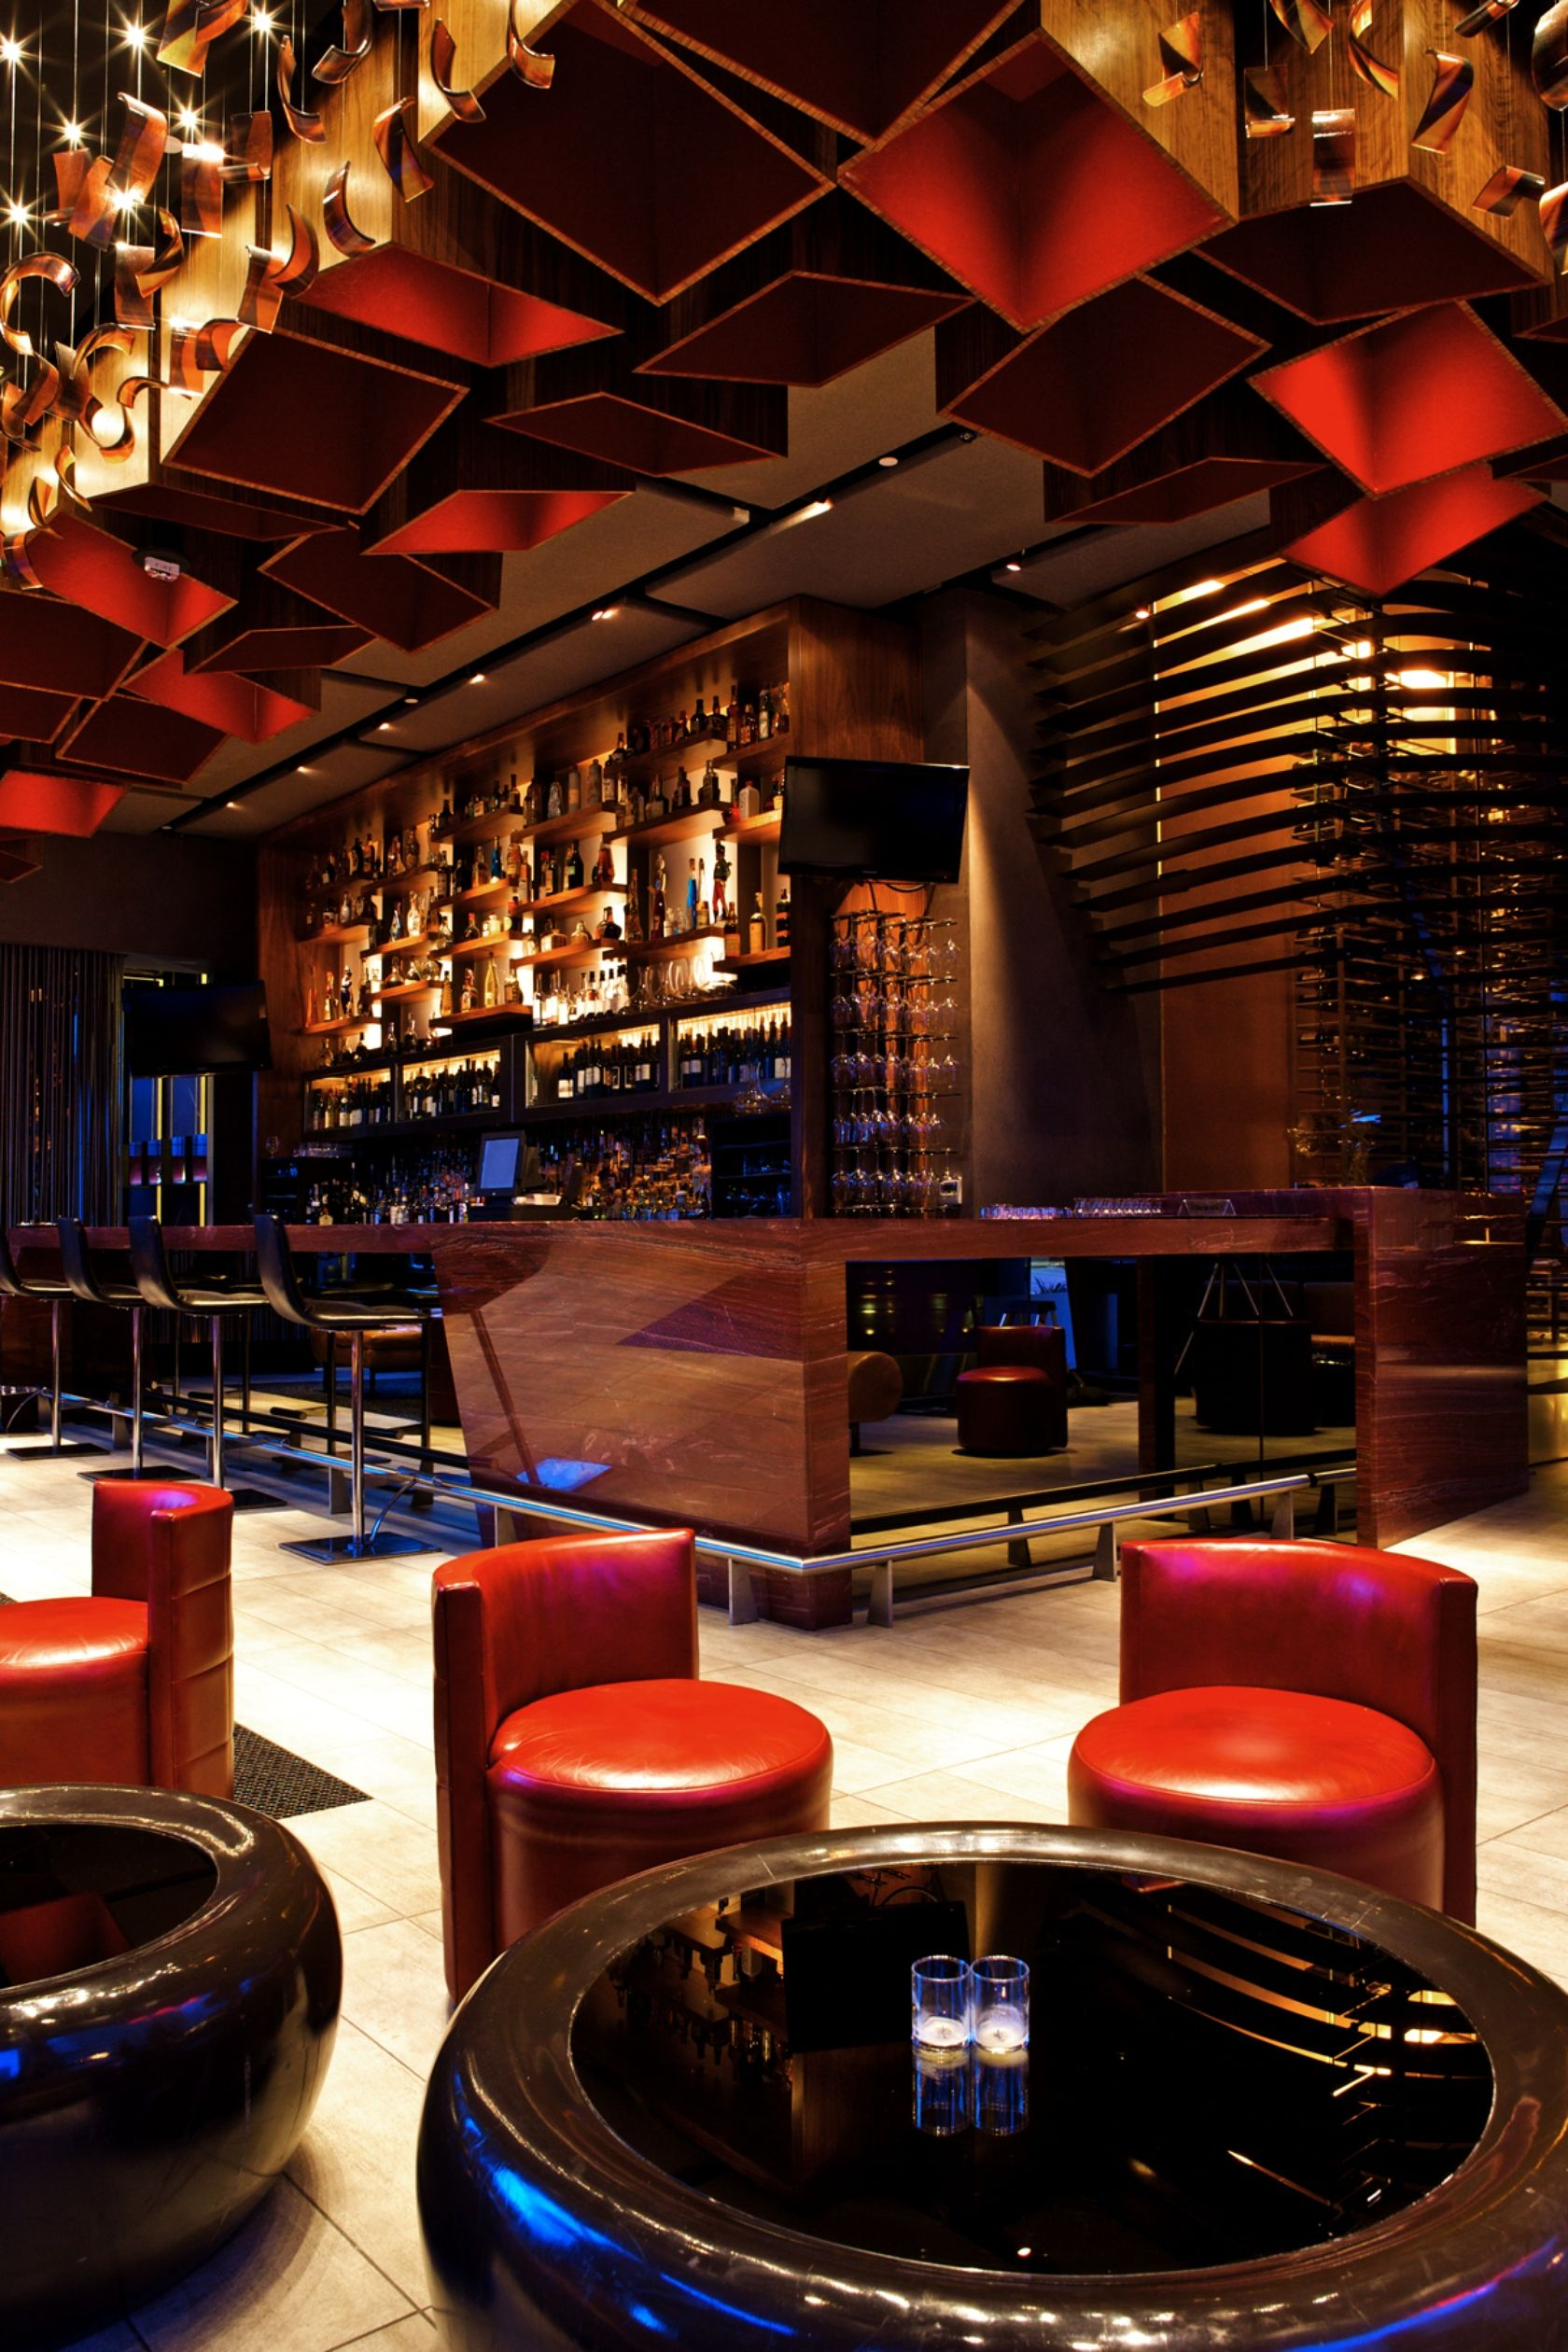 BOA Restaurant, West Hollywood, California designed by Tag